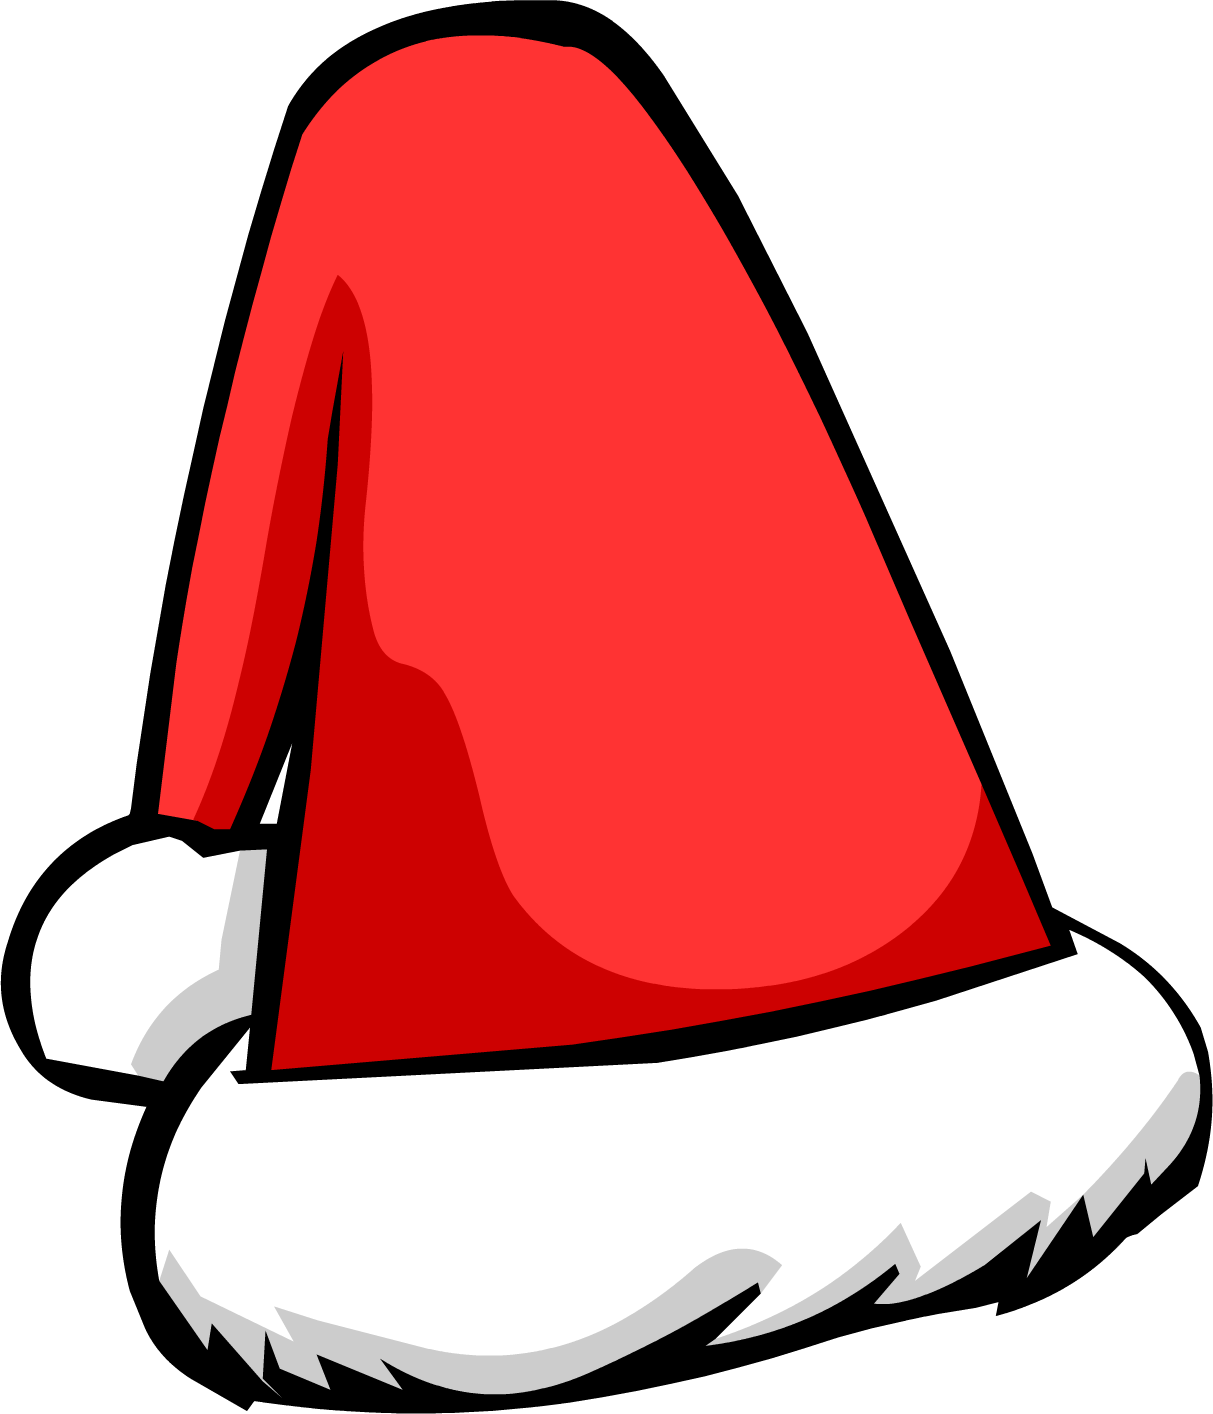 Santa Hat | Club Penguin Wiki | FANDOM powered by Wikia